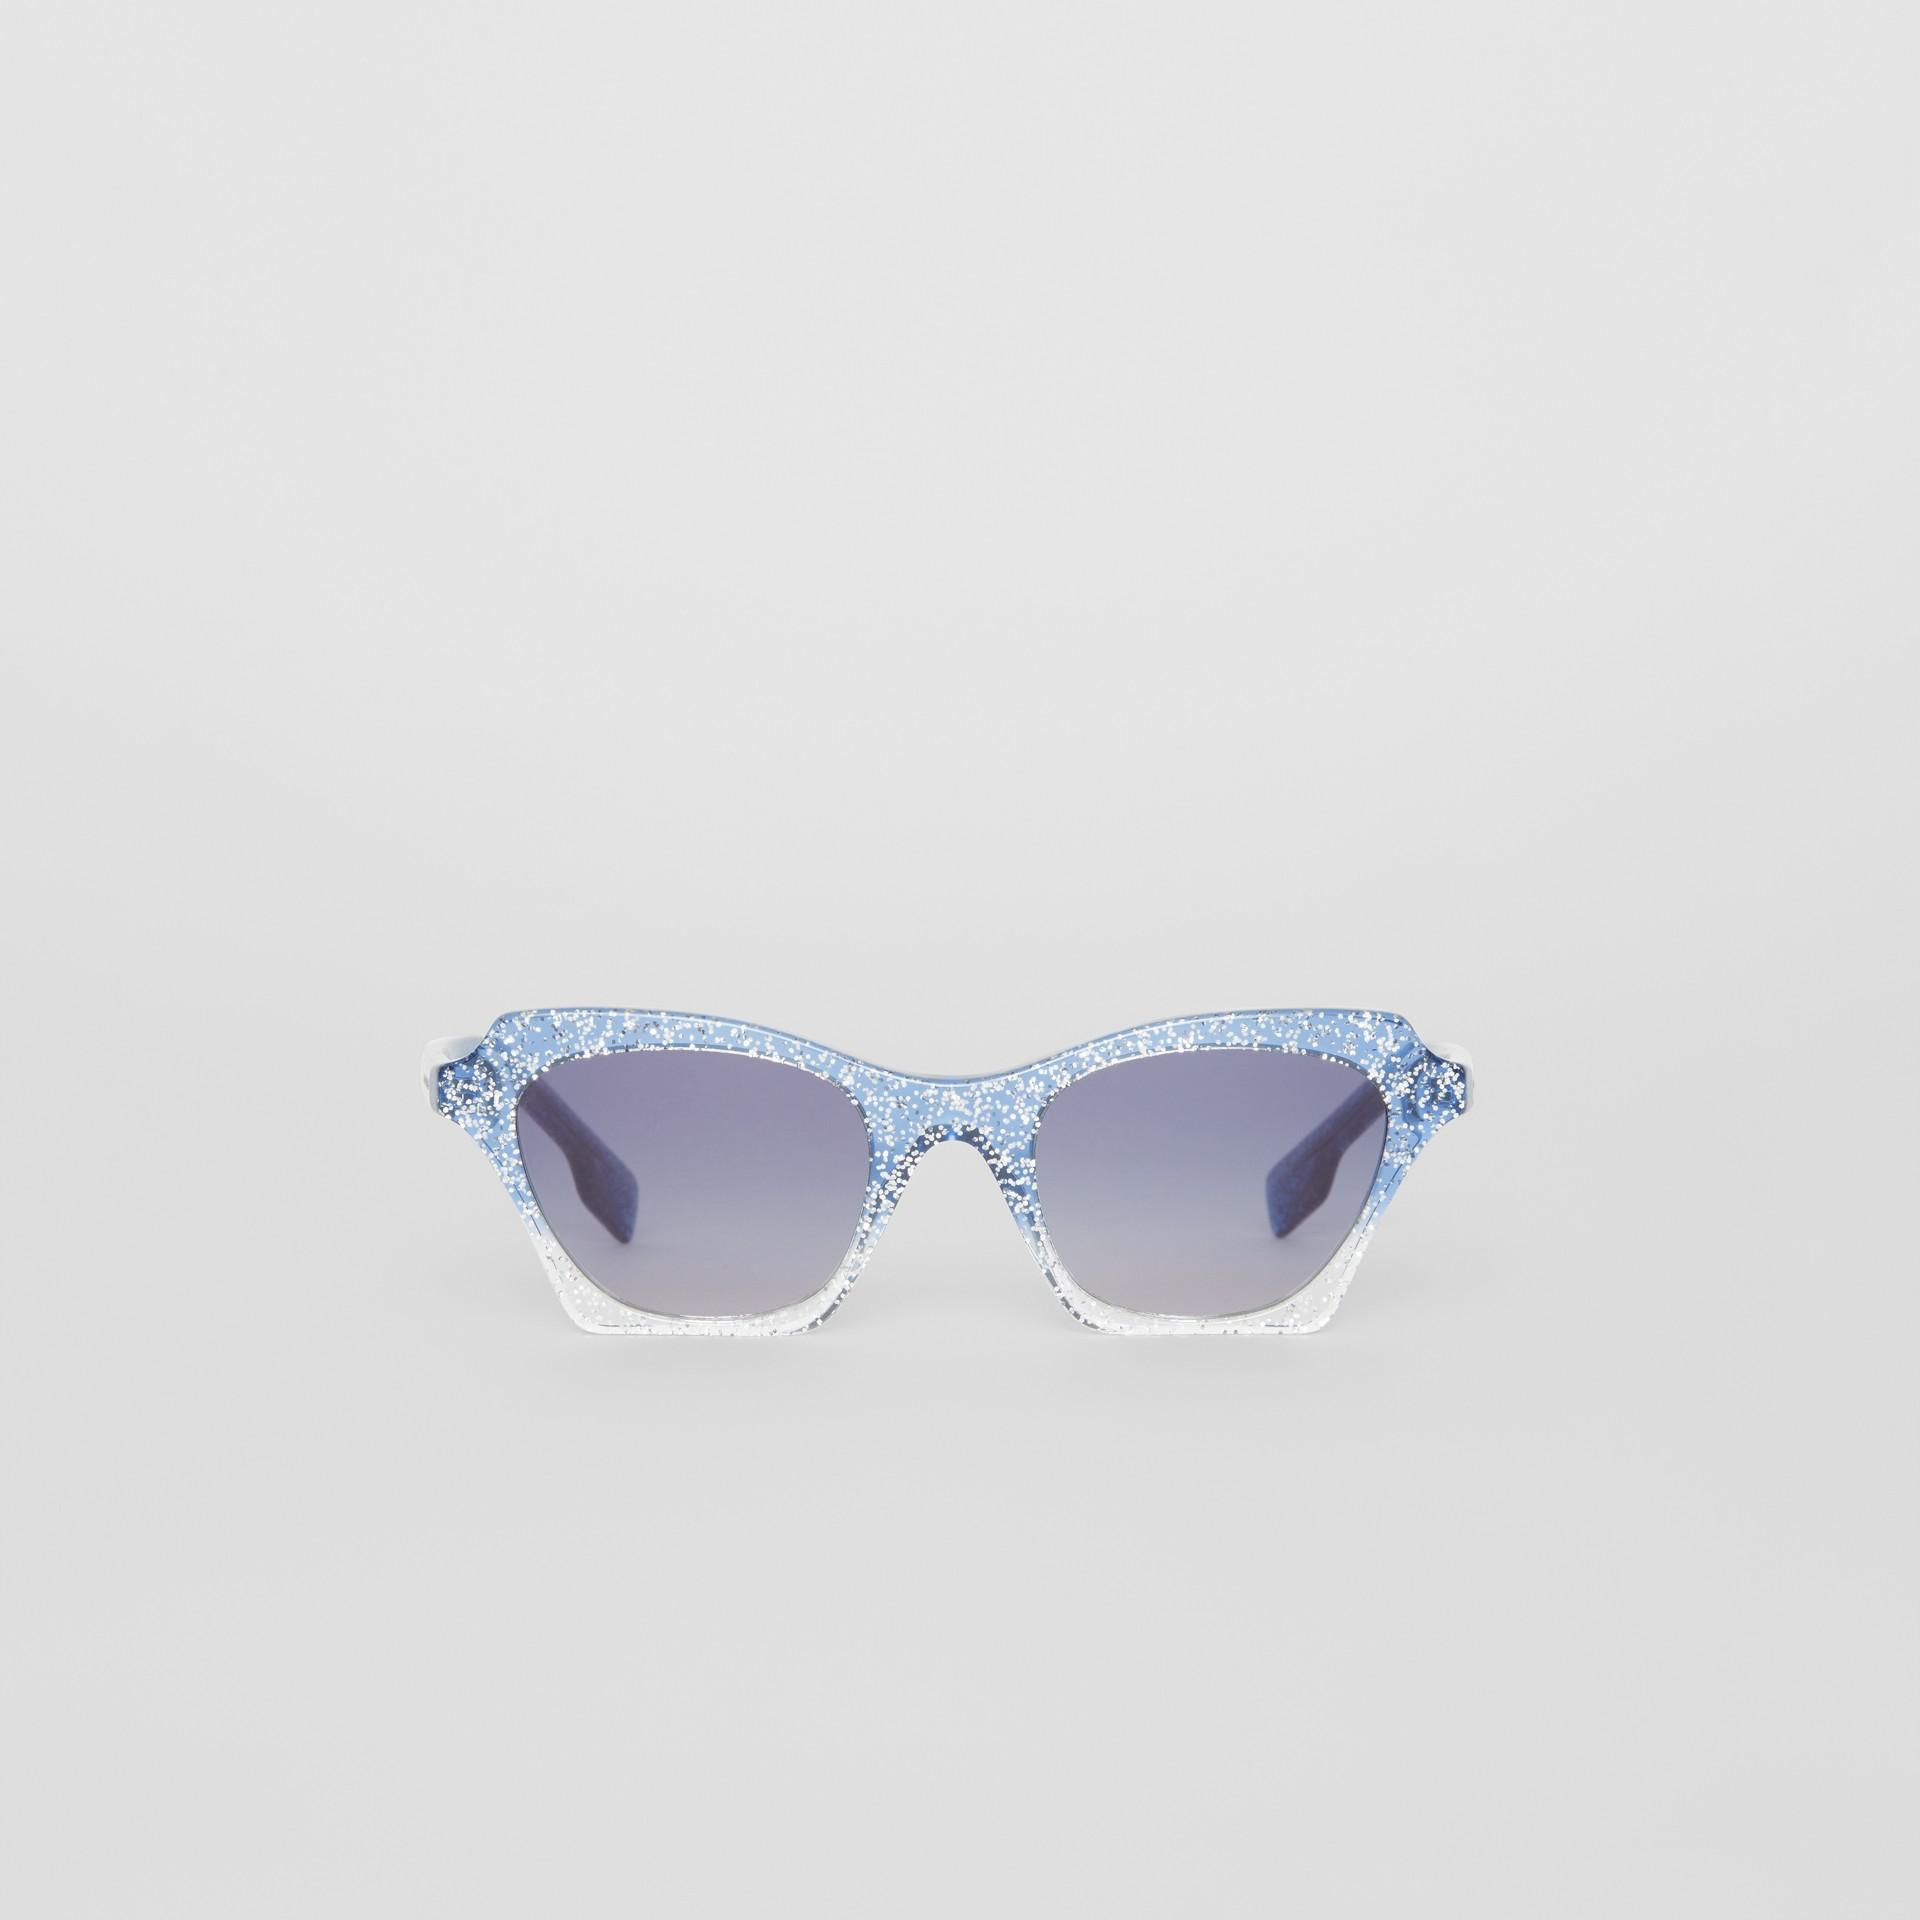 Butterfly Frame Sunglasses in Blue - Women | Burberry Australia - gallery image 0